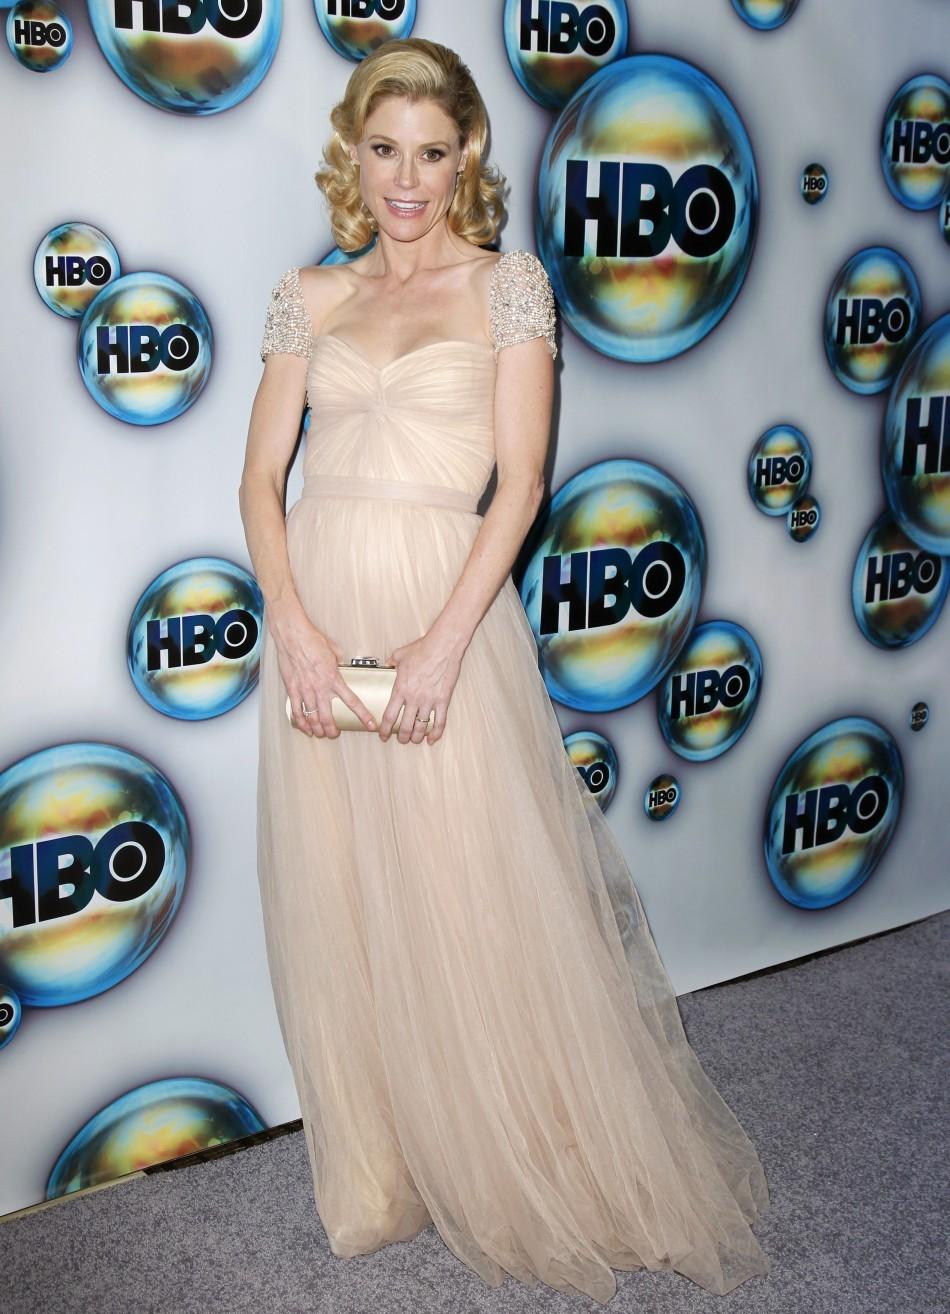 The Emmy Awards 2012